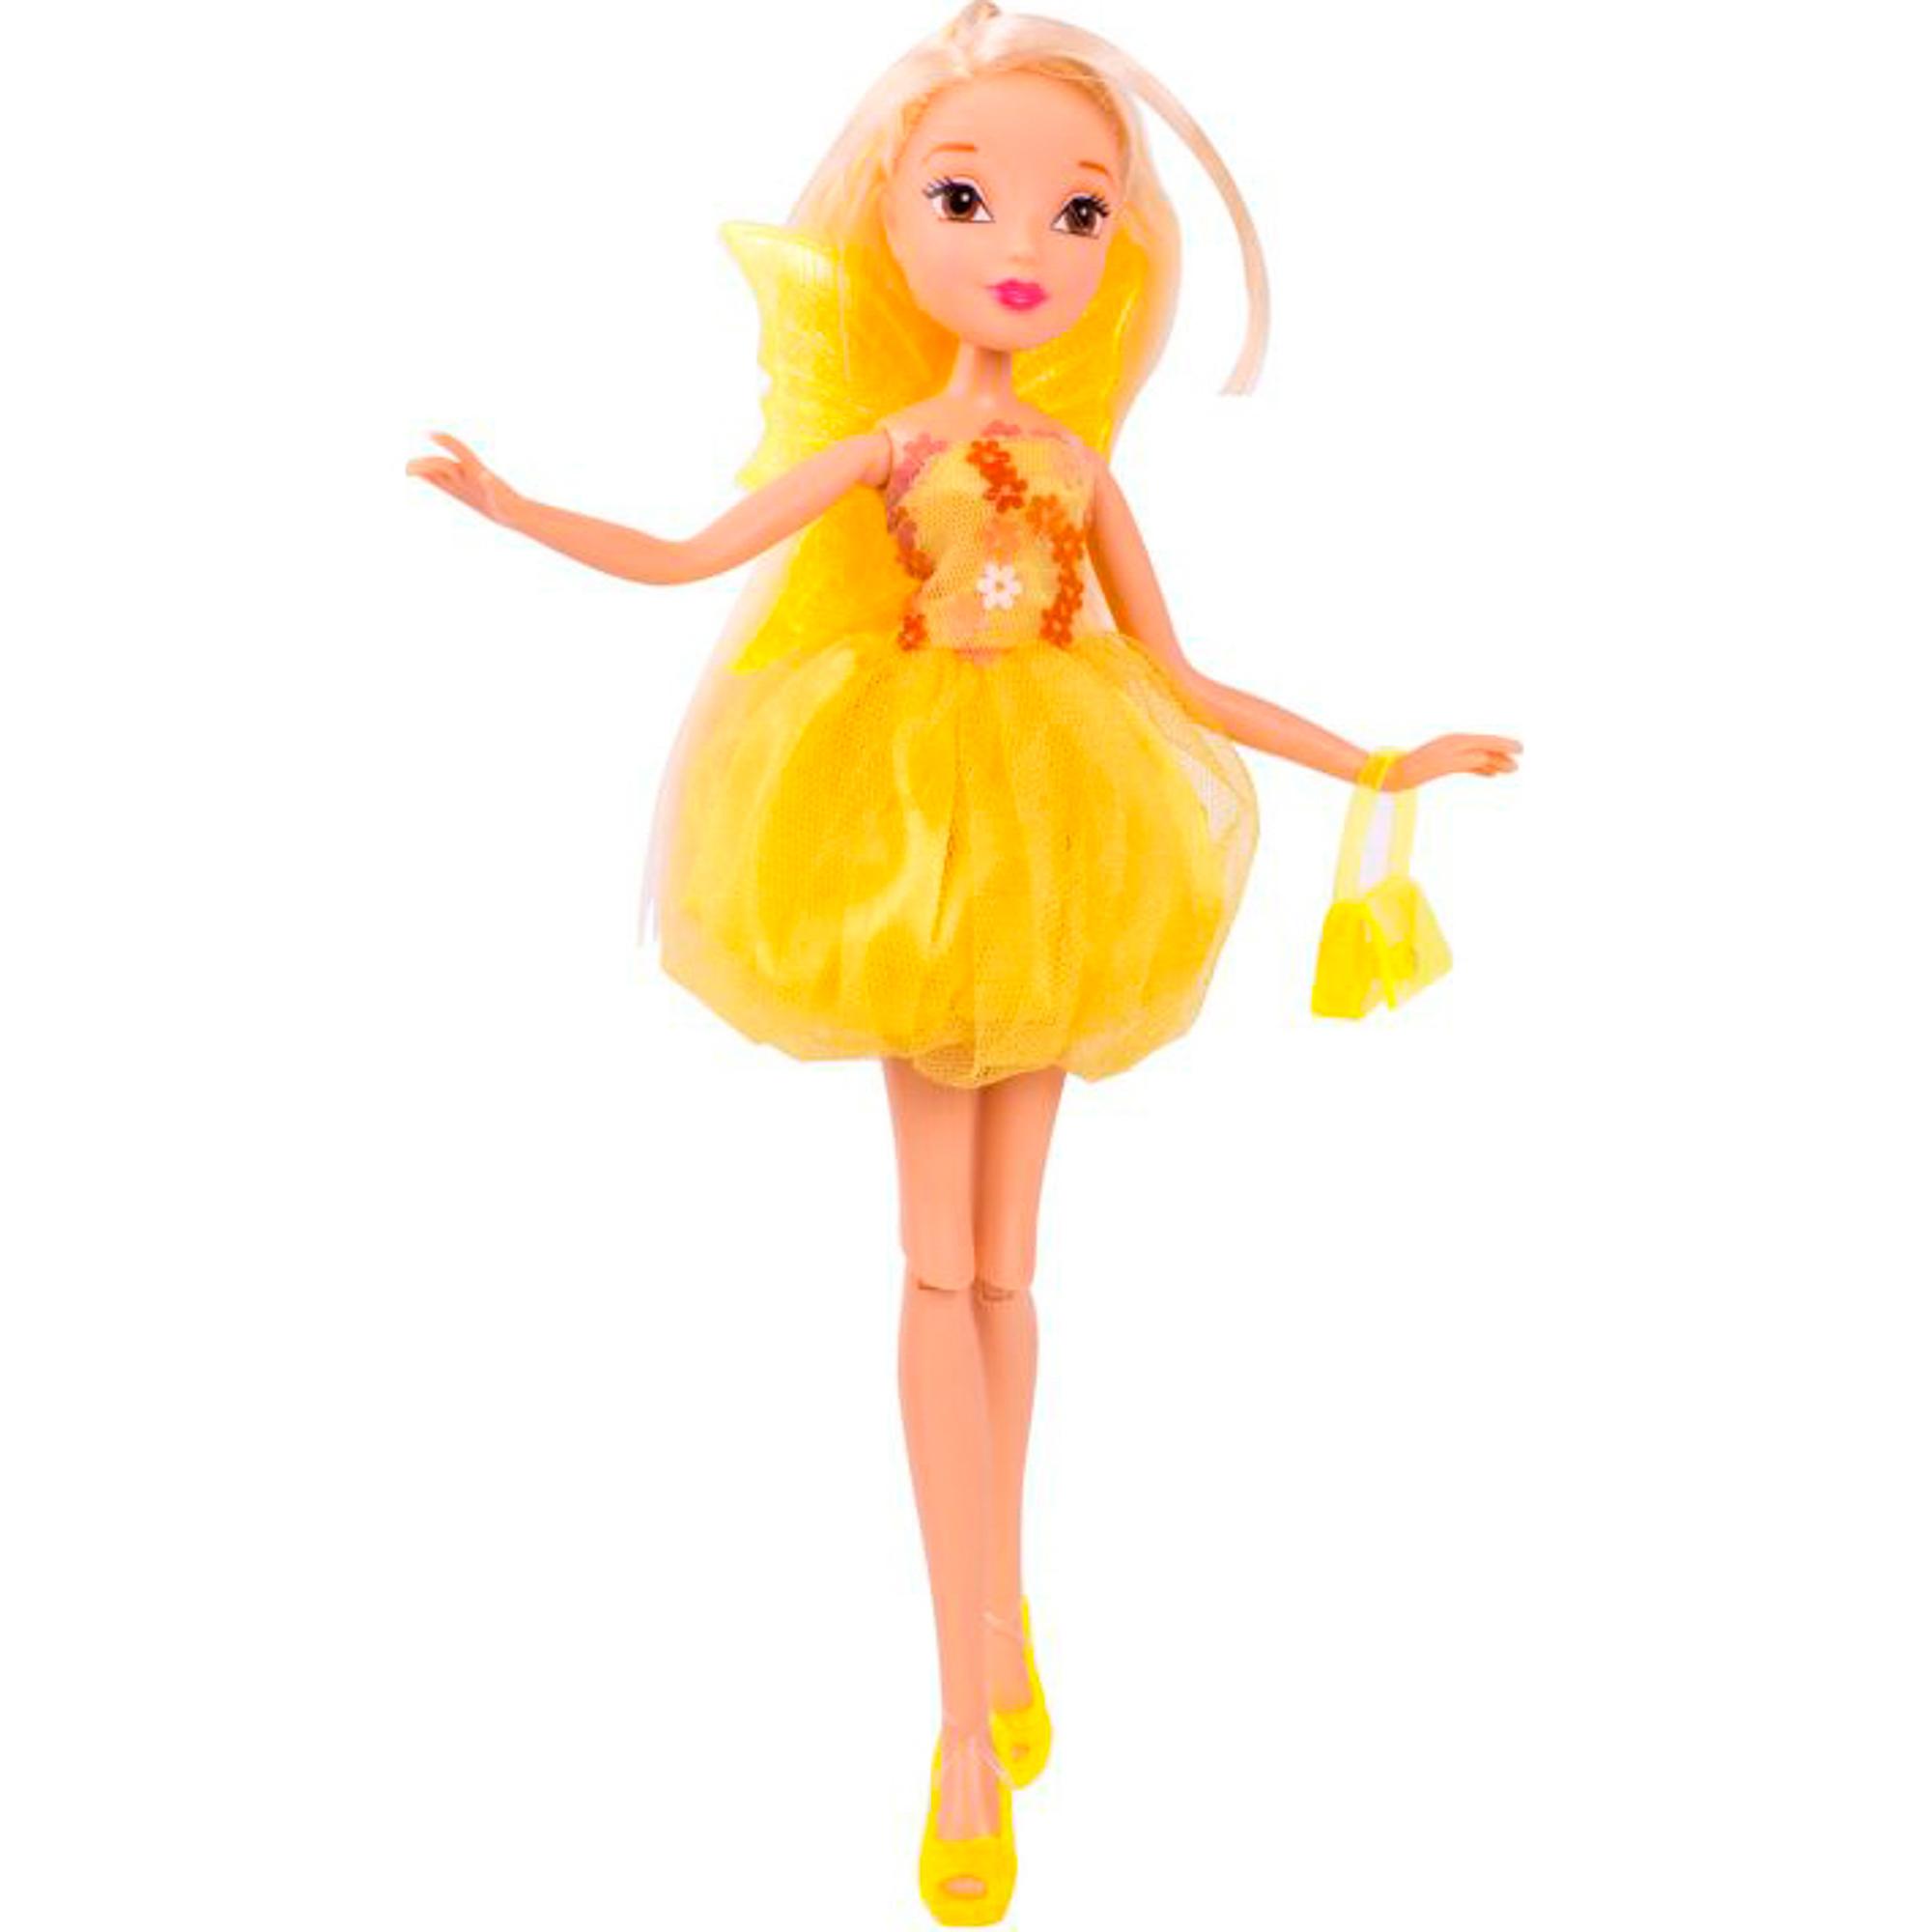 Кукла Winx Club Бон Бон Стелла 28 см кукла winx club бон бон лейла 28 см